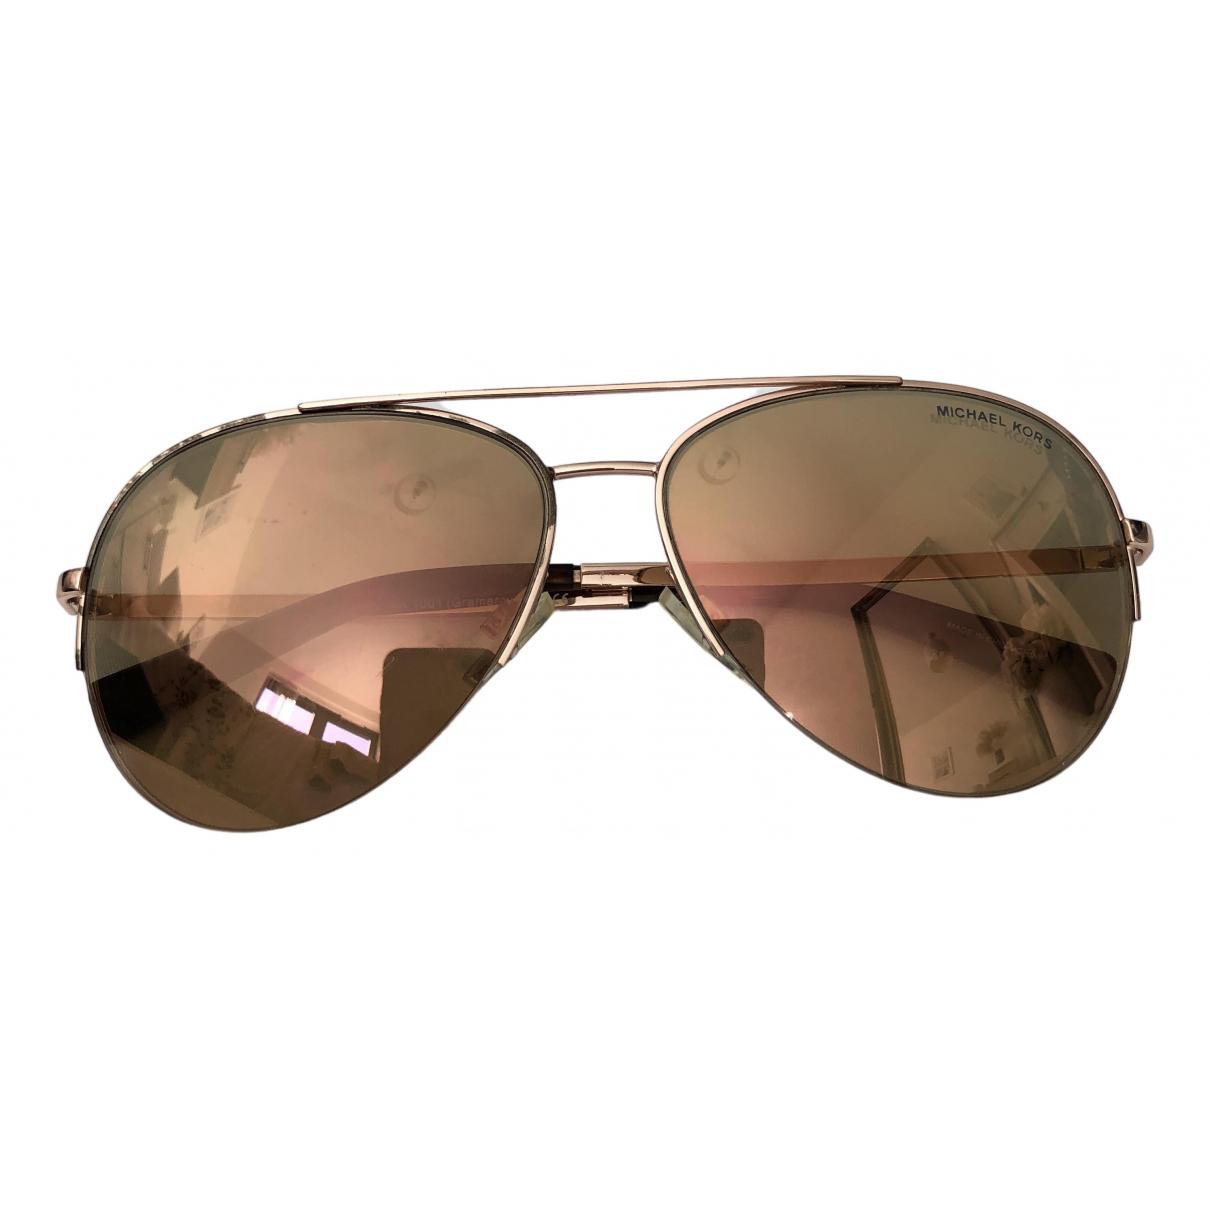 Michael Kors N Multicolour Metal Sunglasses for Women N